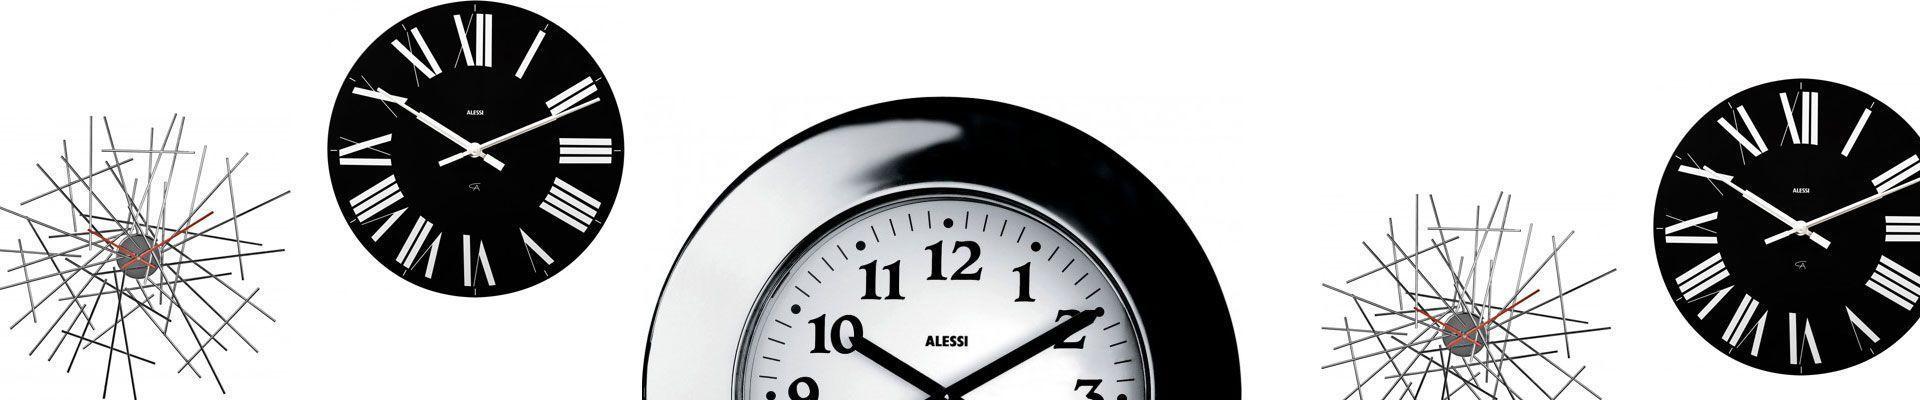 Alessi klokken